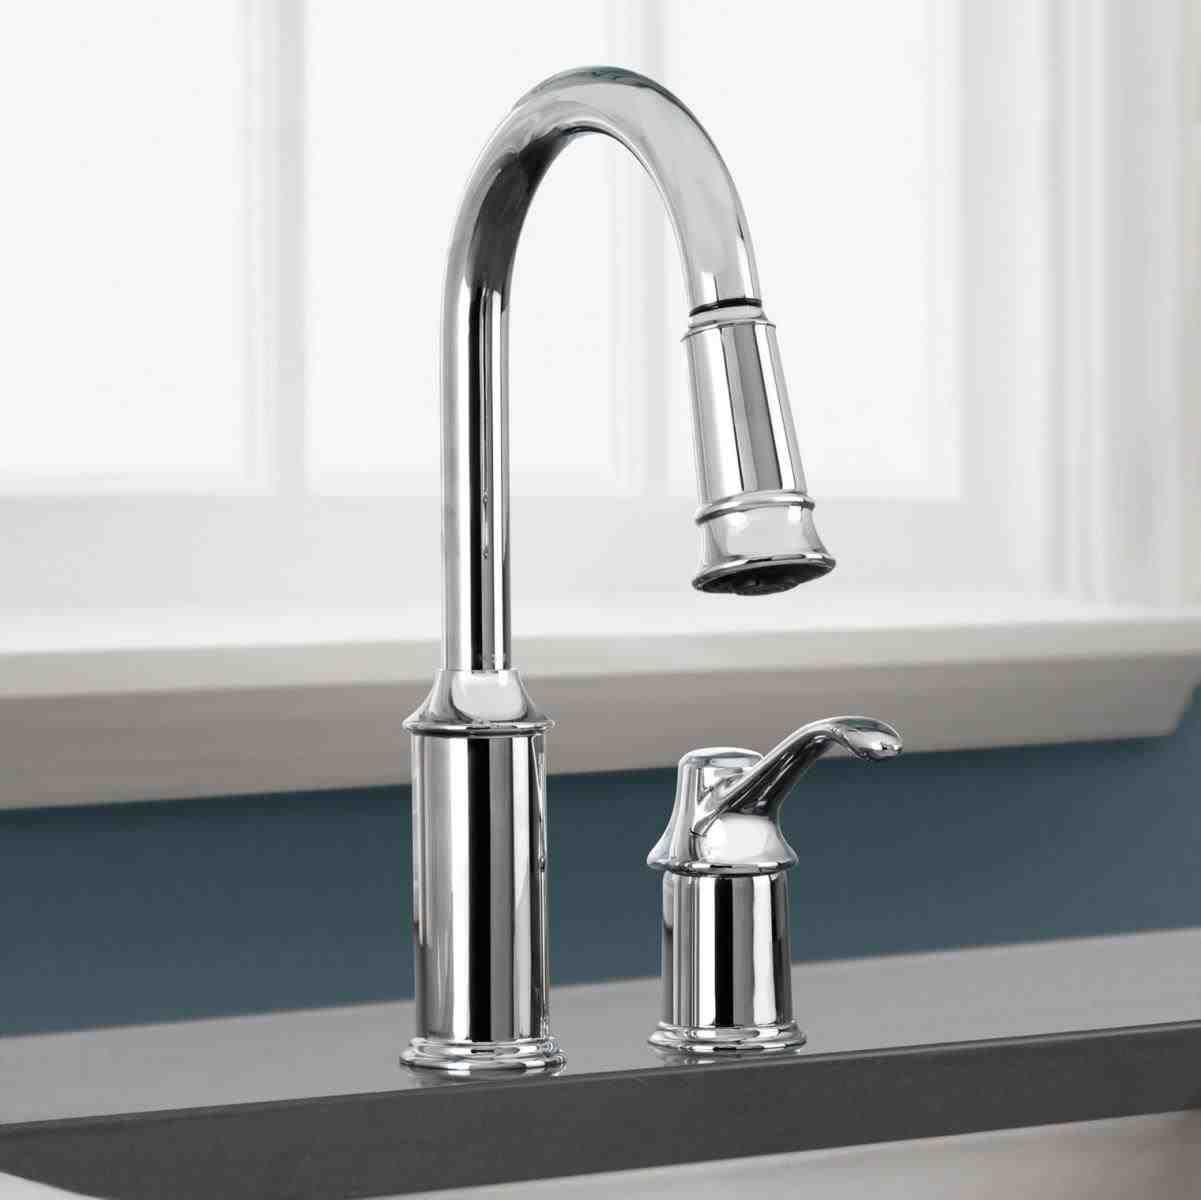 New Post moen 3 hole kitchen faucet | Decors Ideas | Pinterest ...